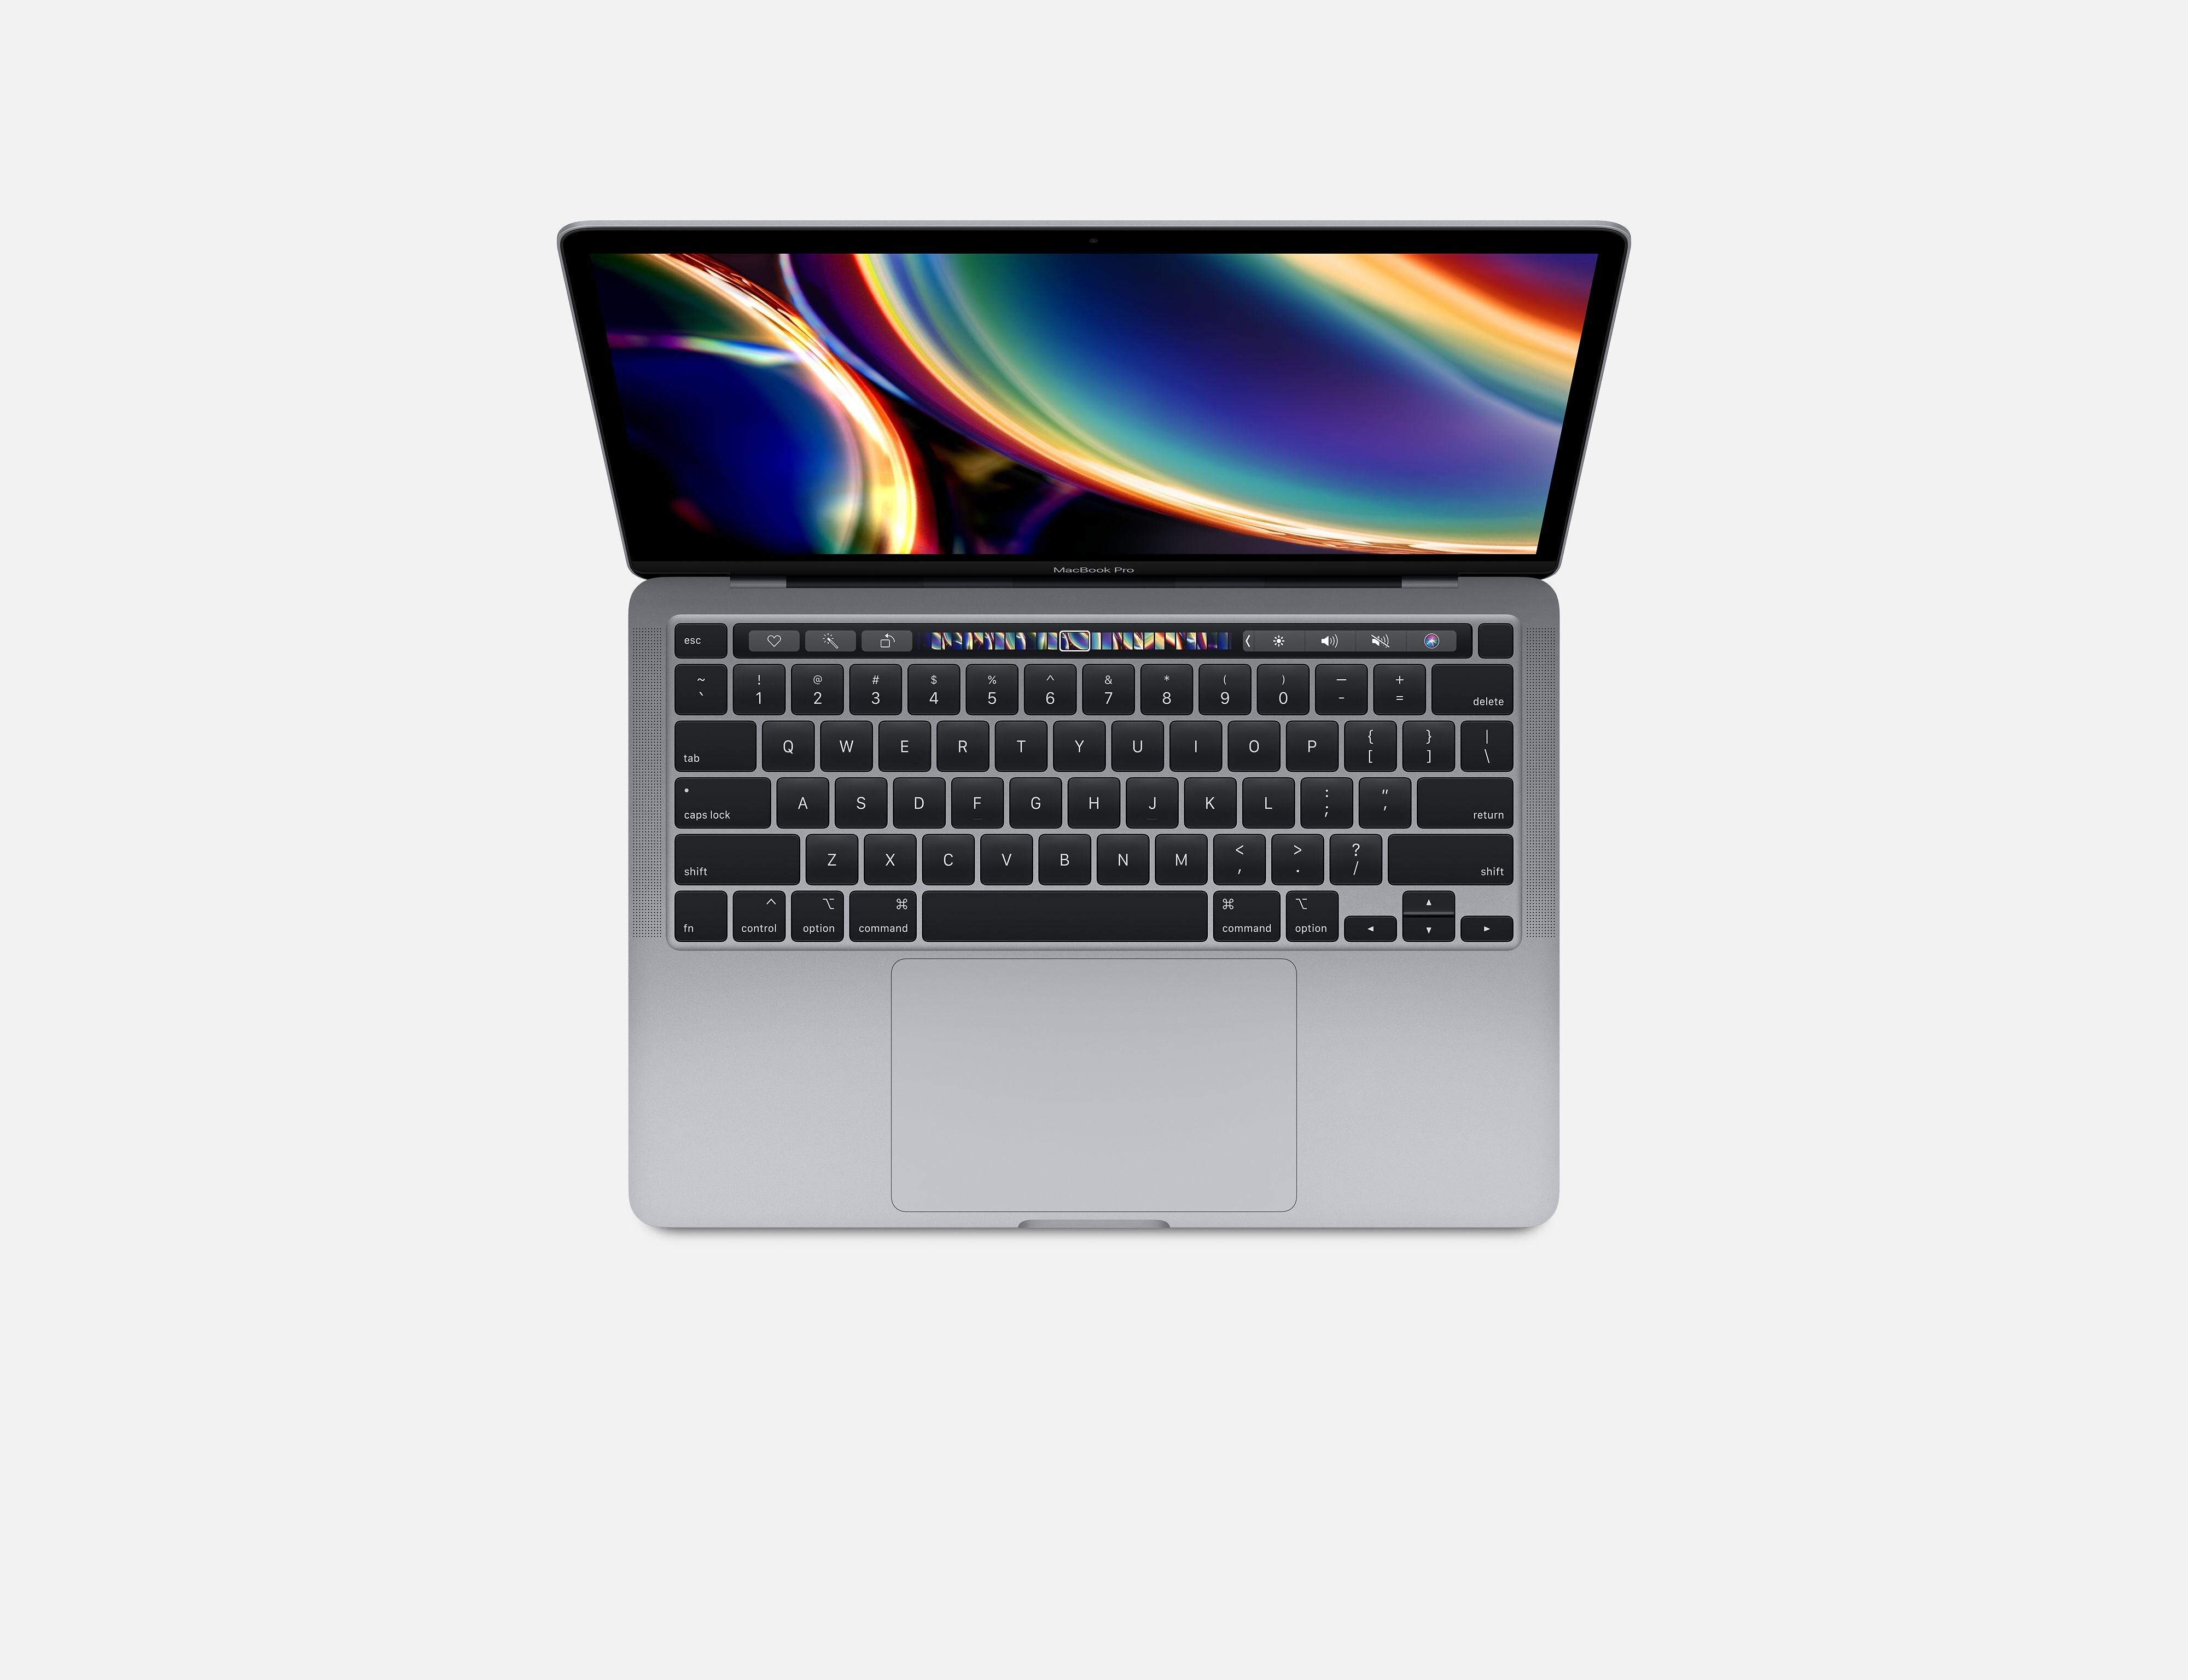 New Original Apple MacBook Pro Latest Model 13.3